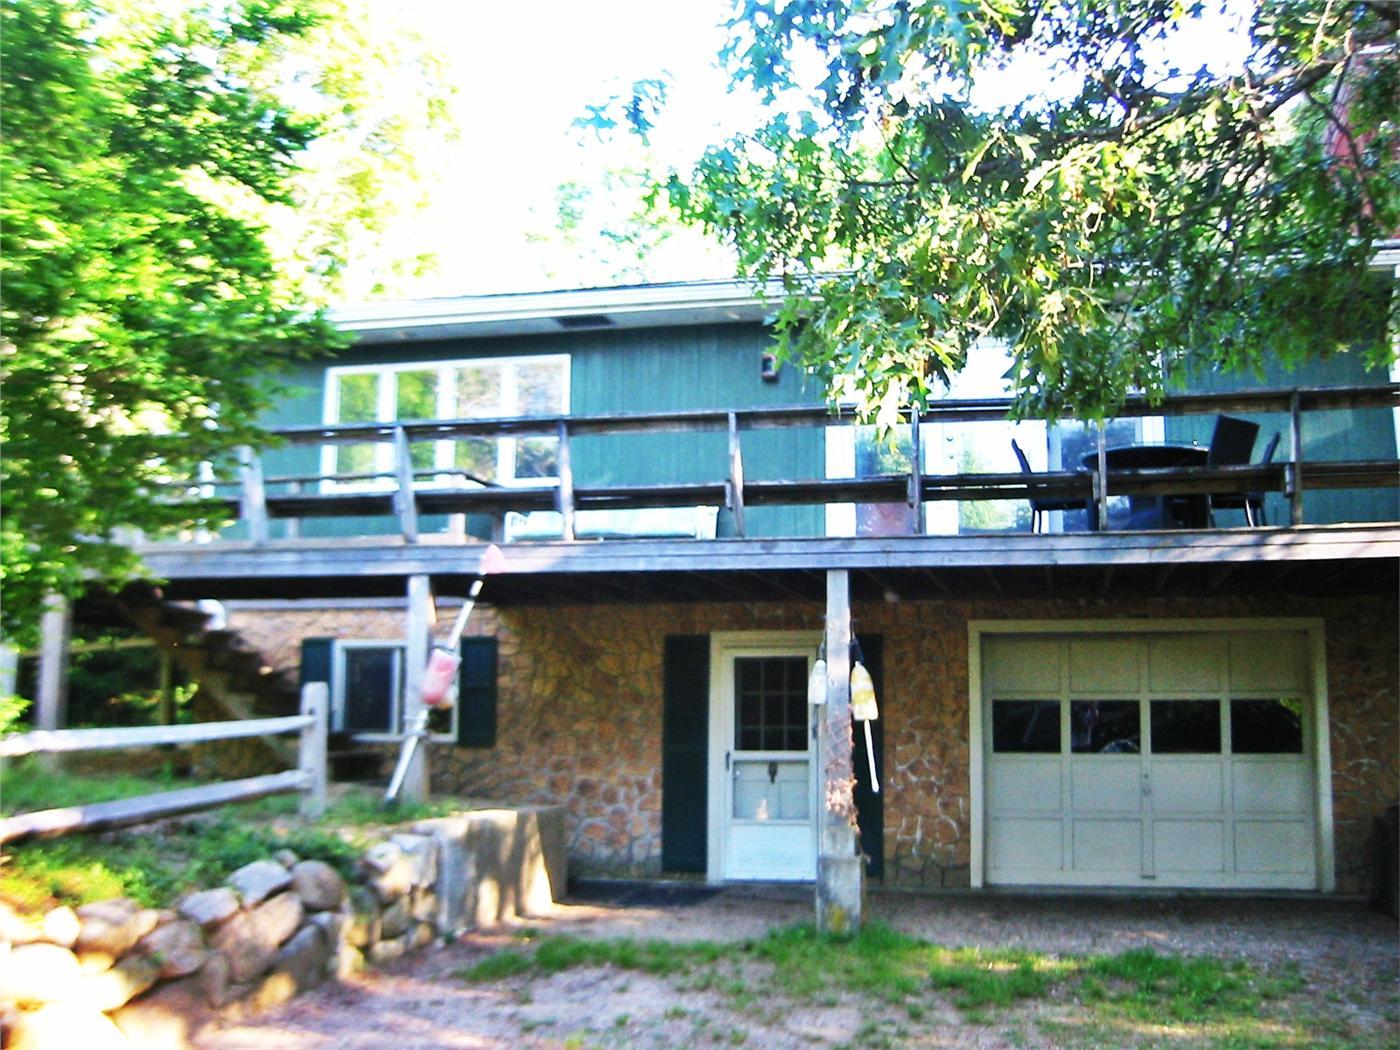 Oak Bluffs Vacation Rental Home In Martha's Vineyard MA